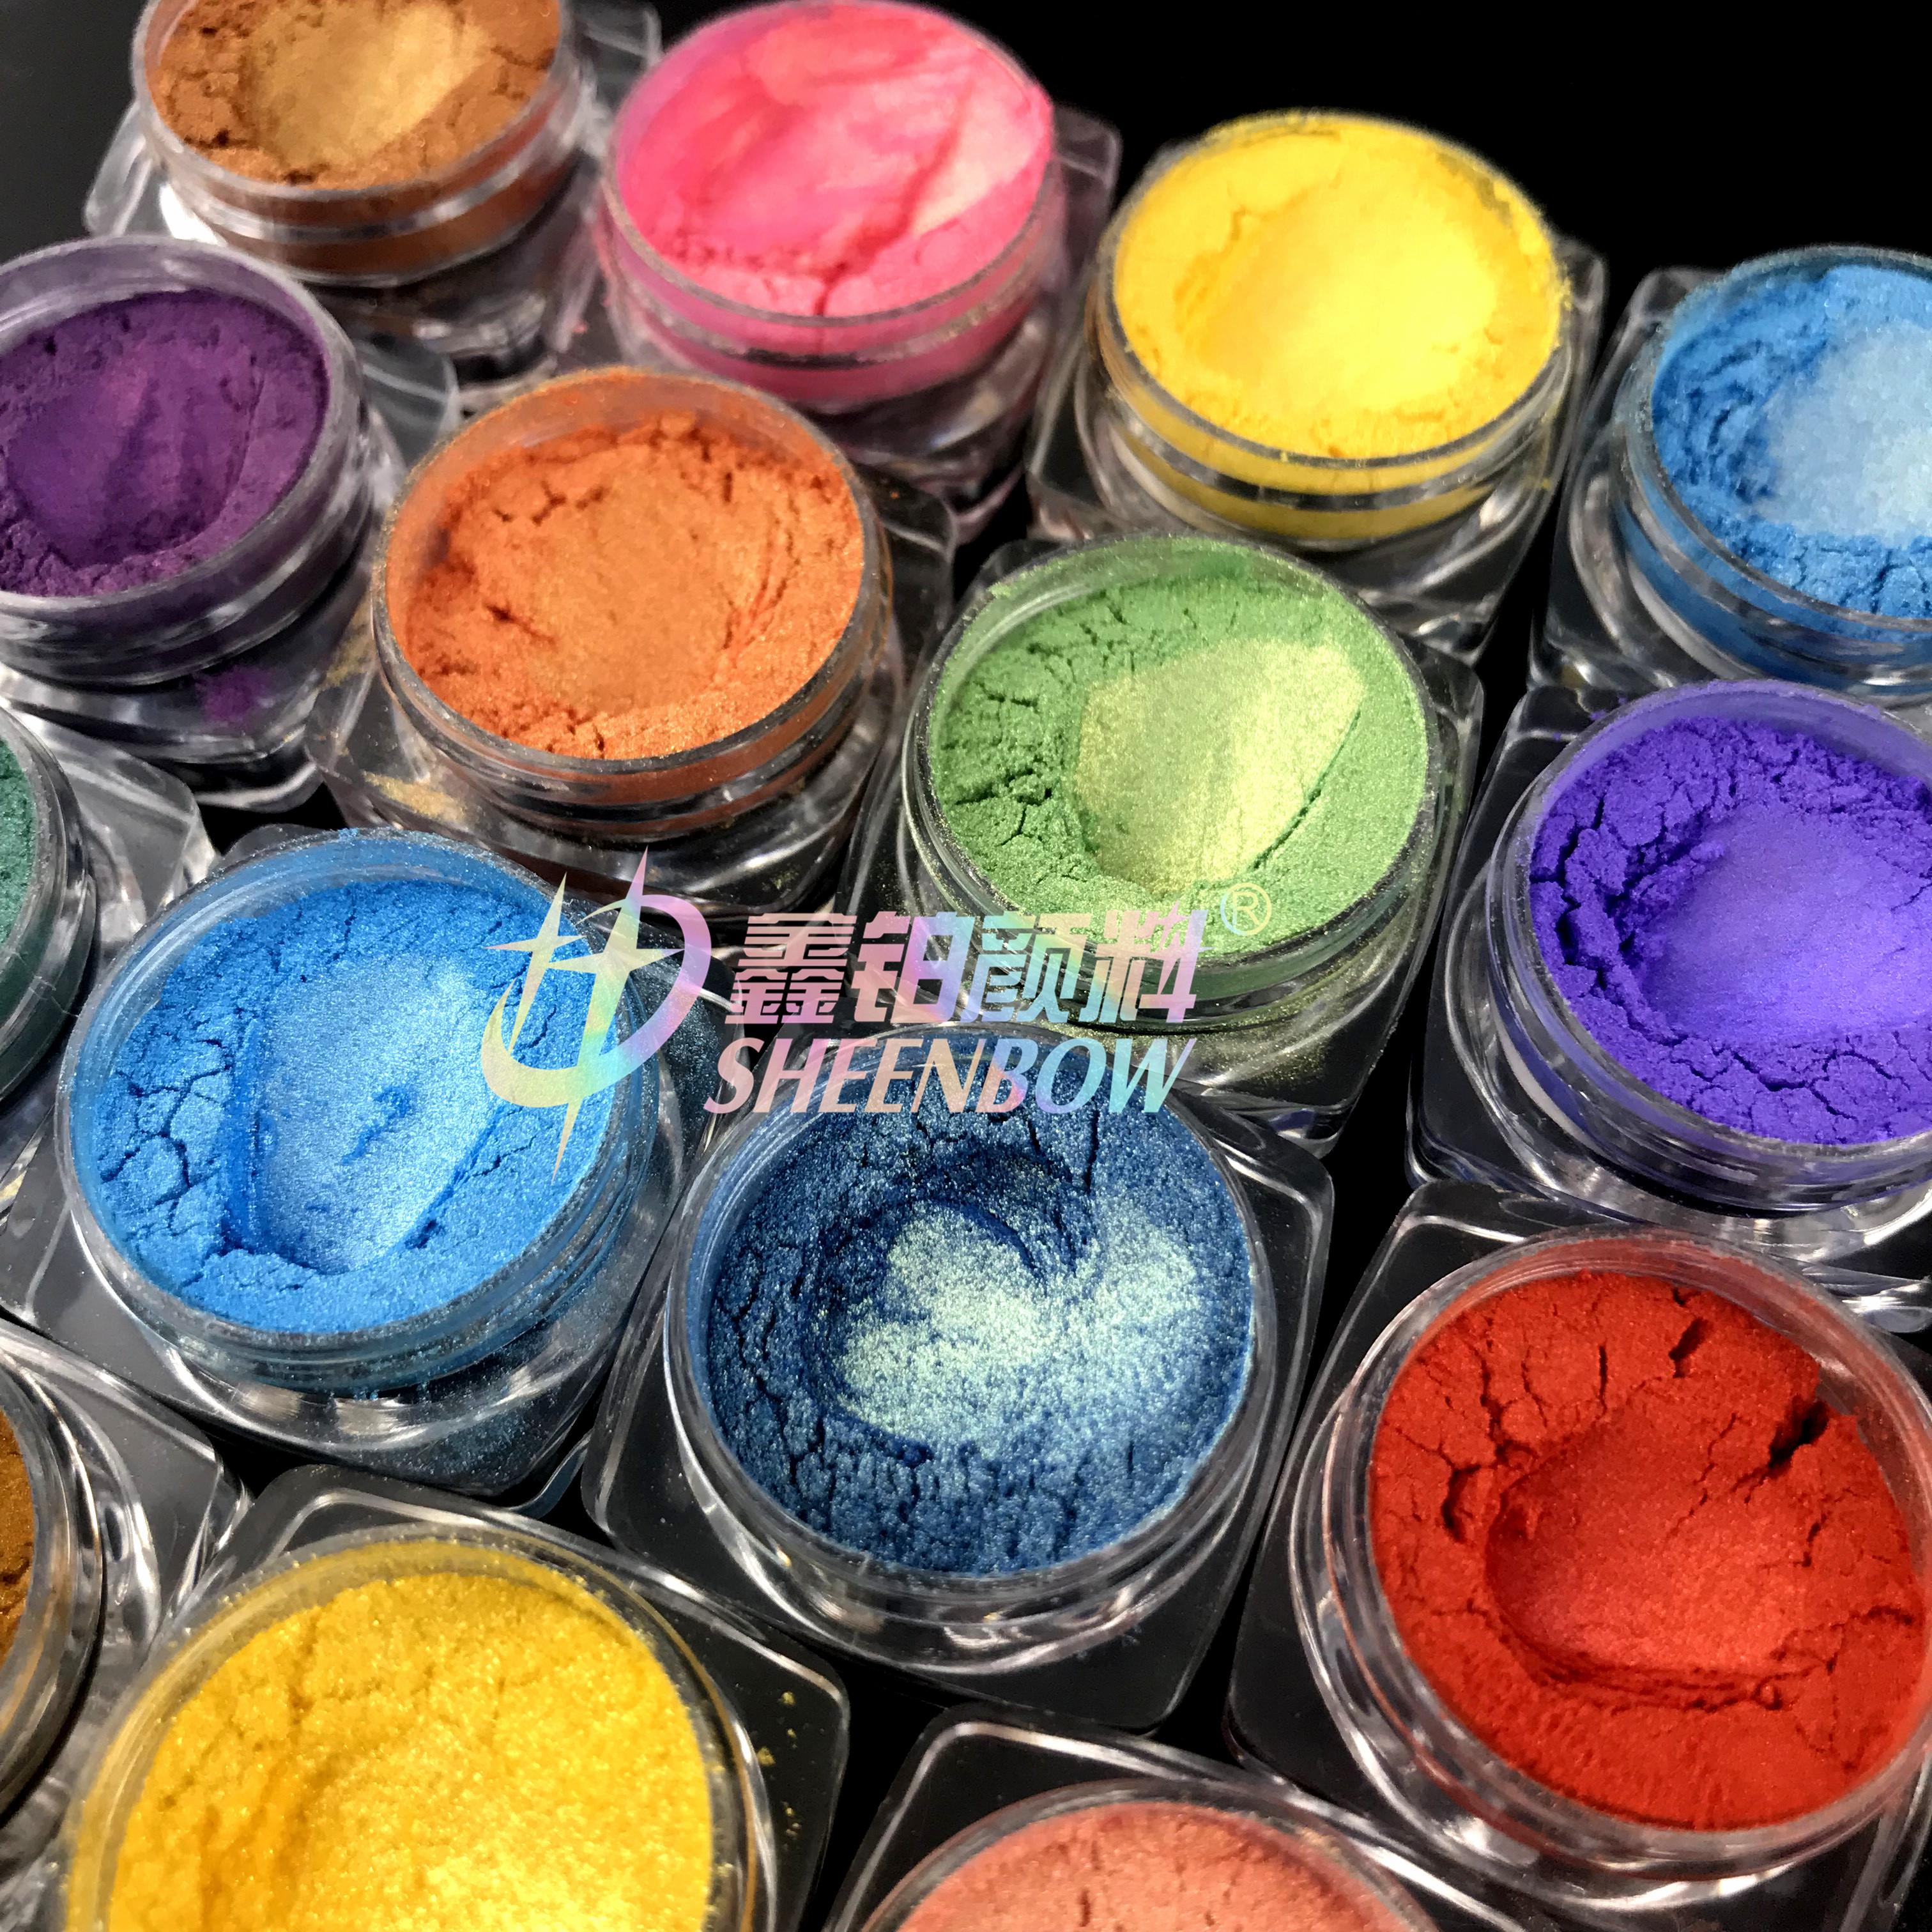 Sheenbow Mica Cosmetic Pigment Metallic Pearl Epoxy Resin Powder